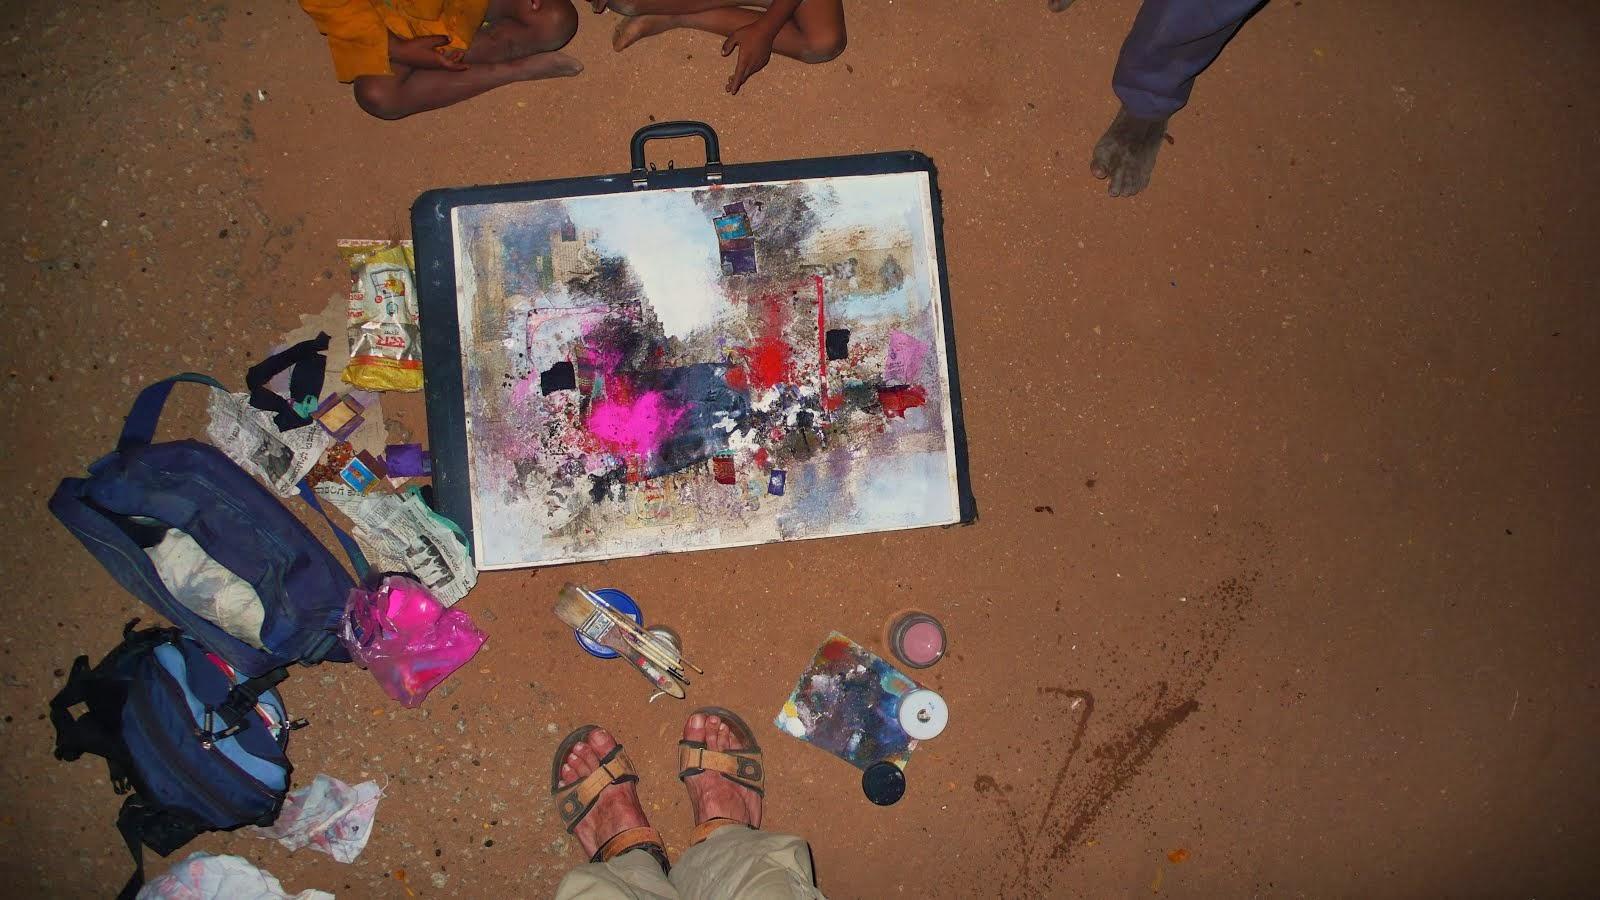 Pintando al anochecer en Hampi, India.